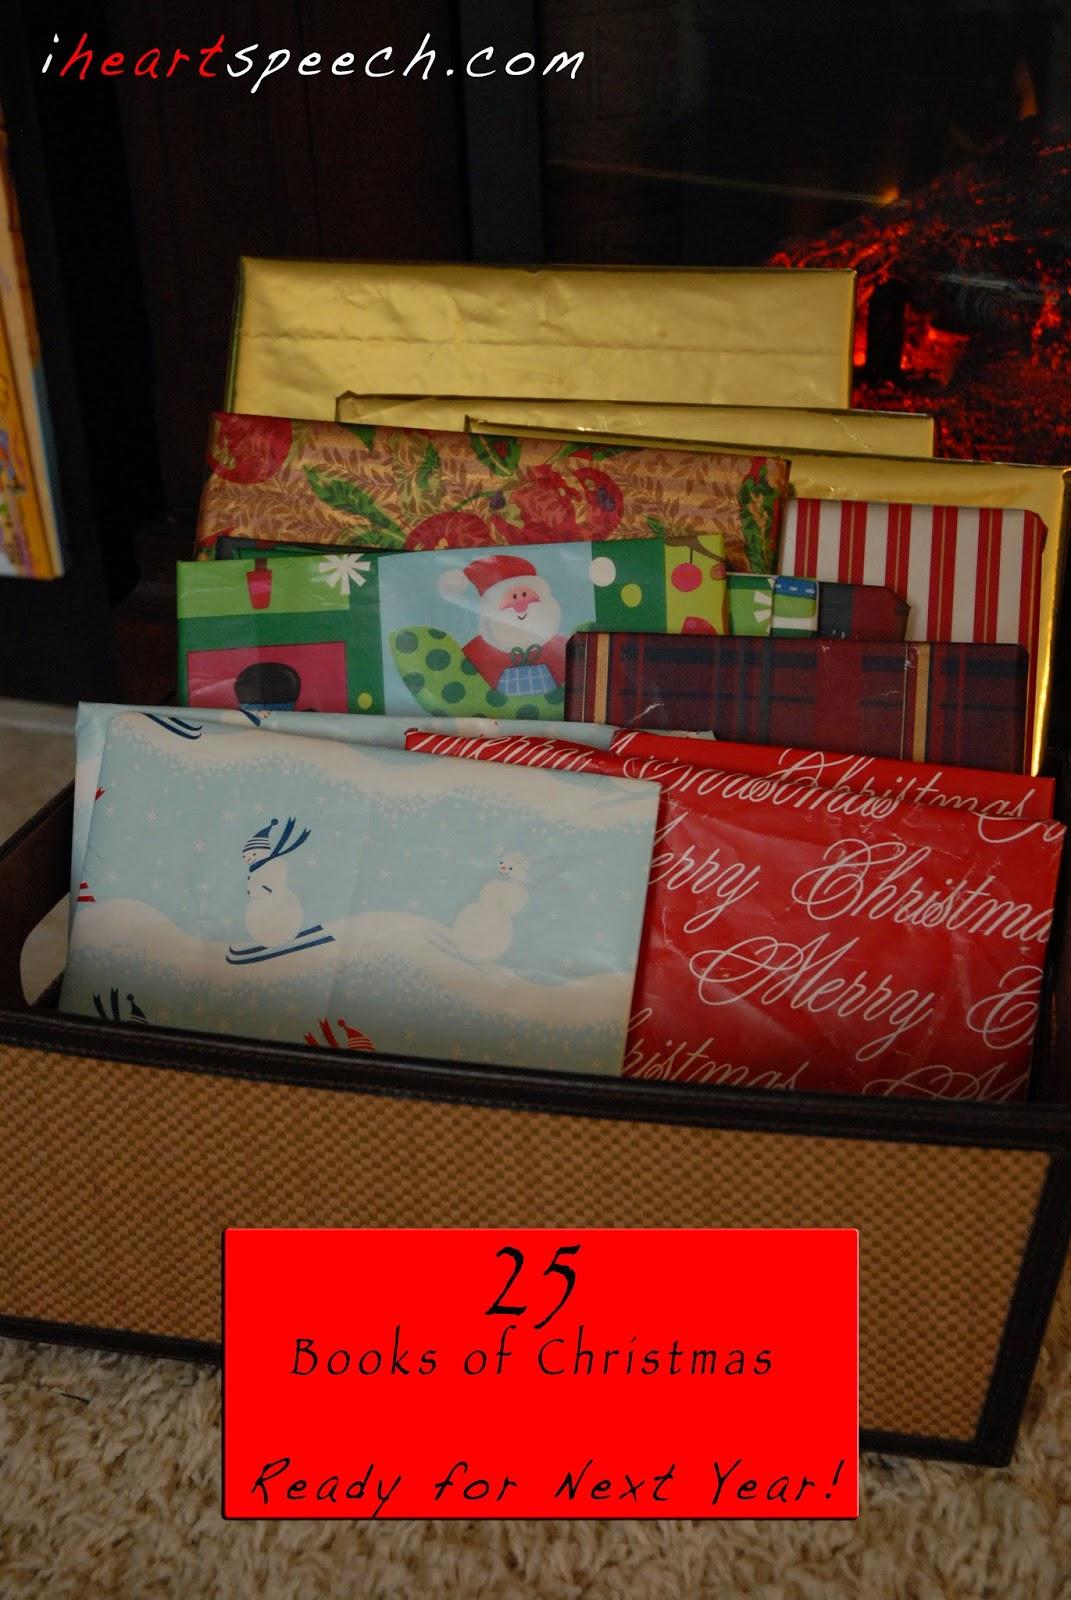 iHeartSpeech.com: 25 Books of Christmas - Ready for Next Year!